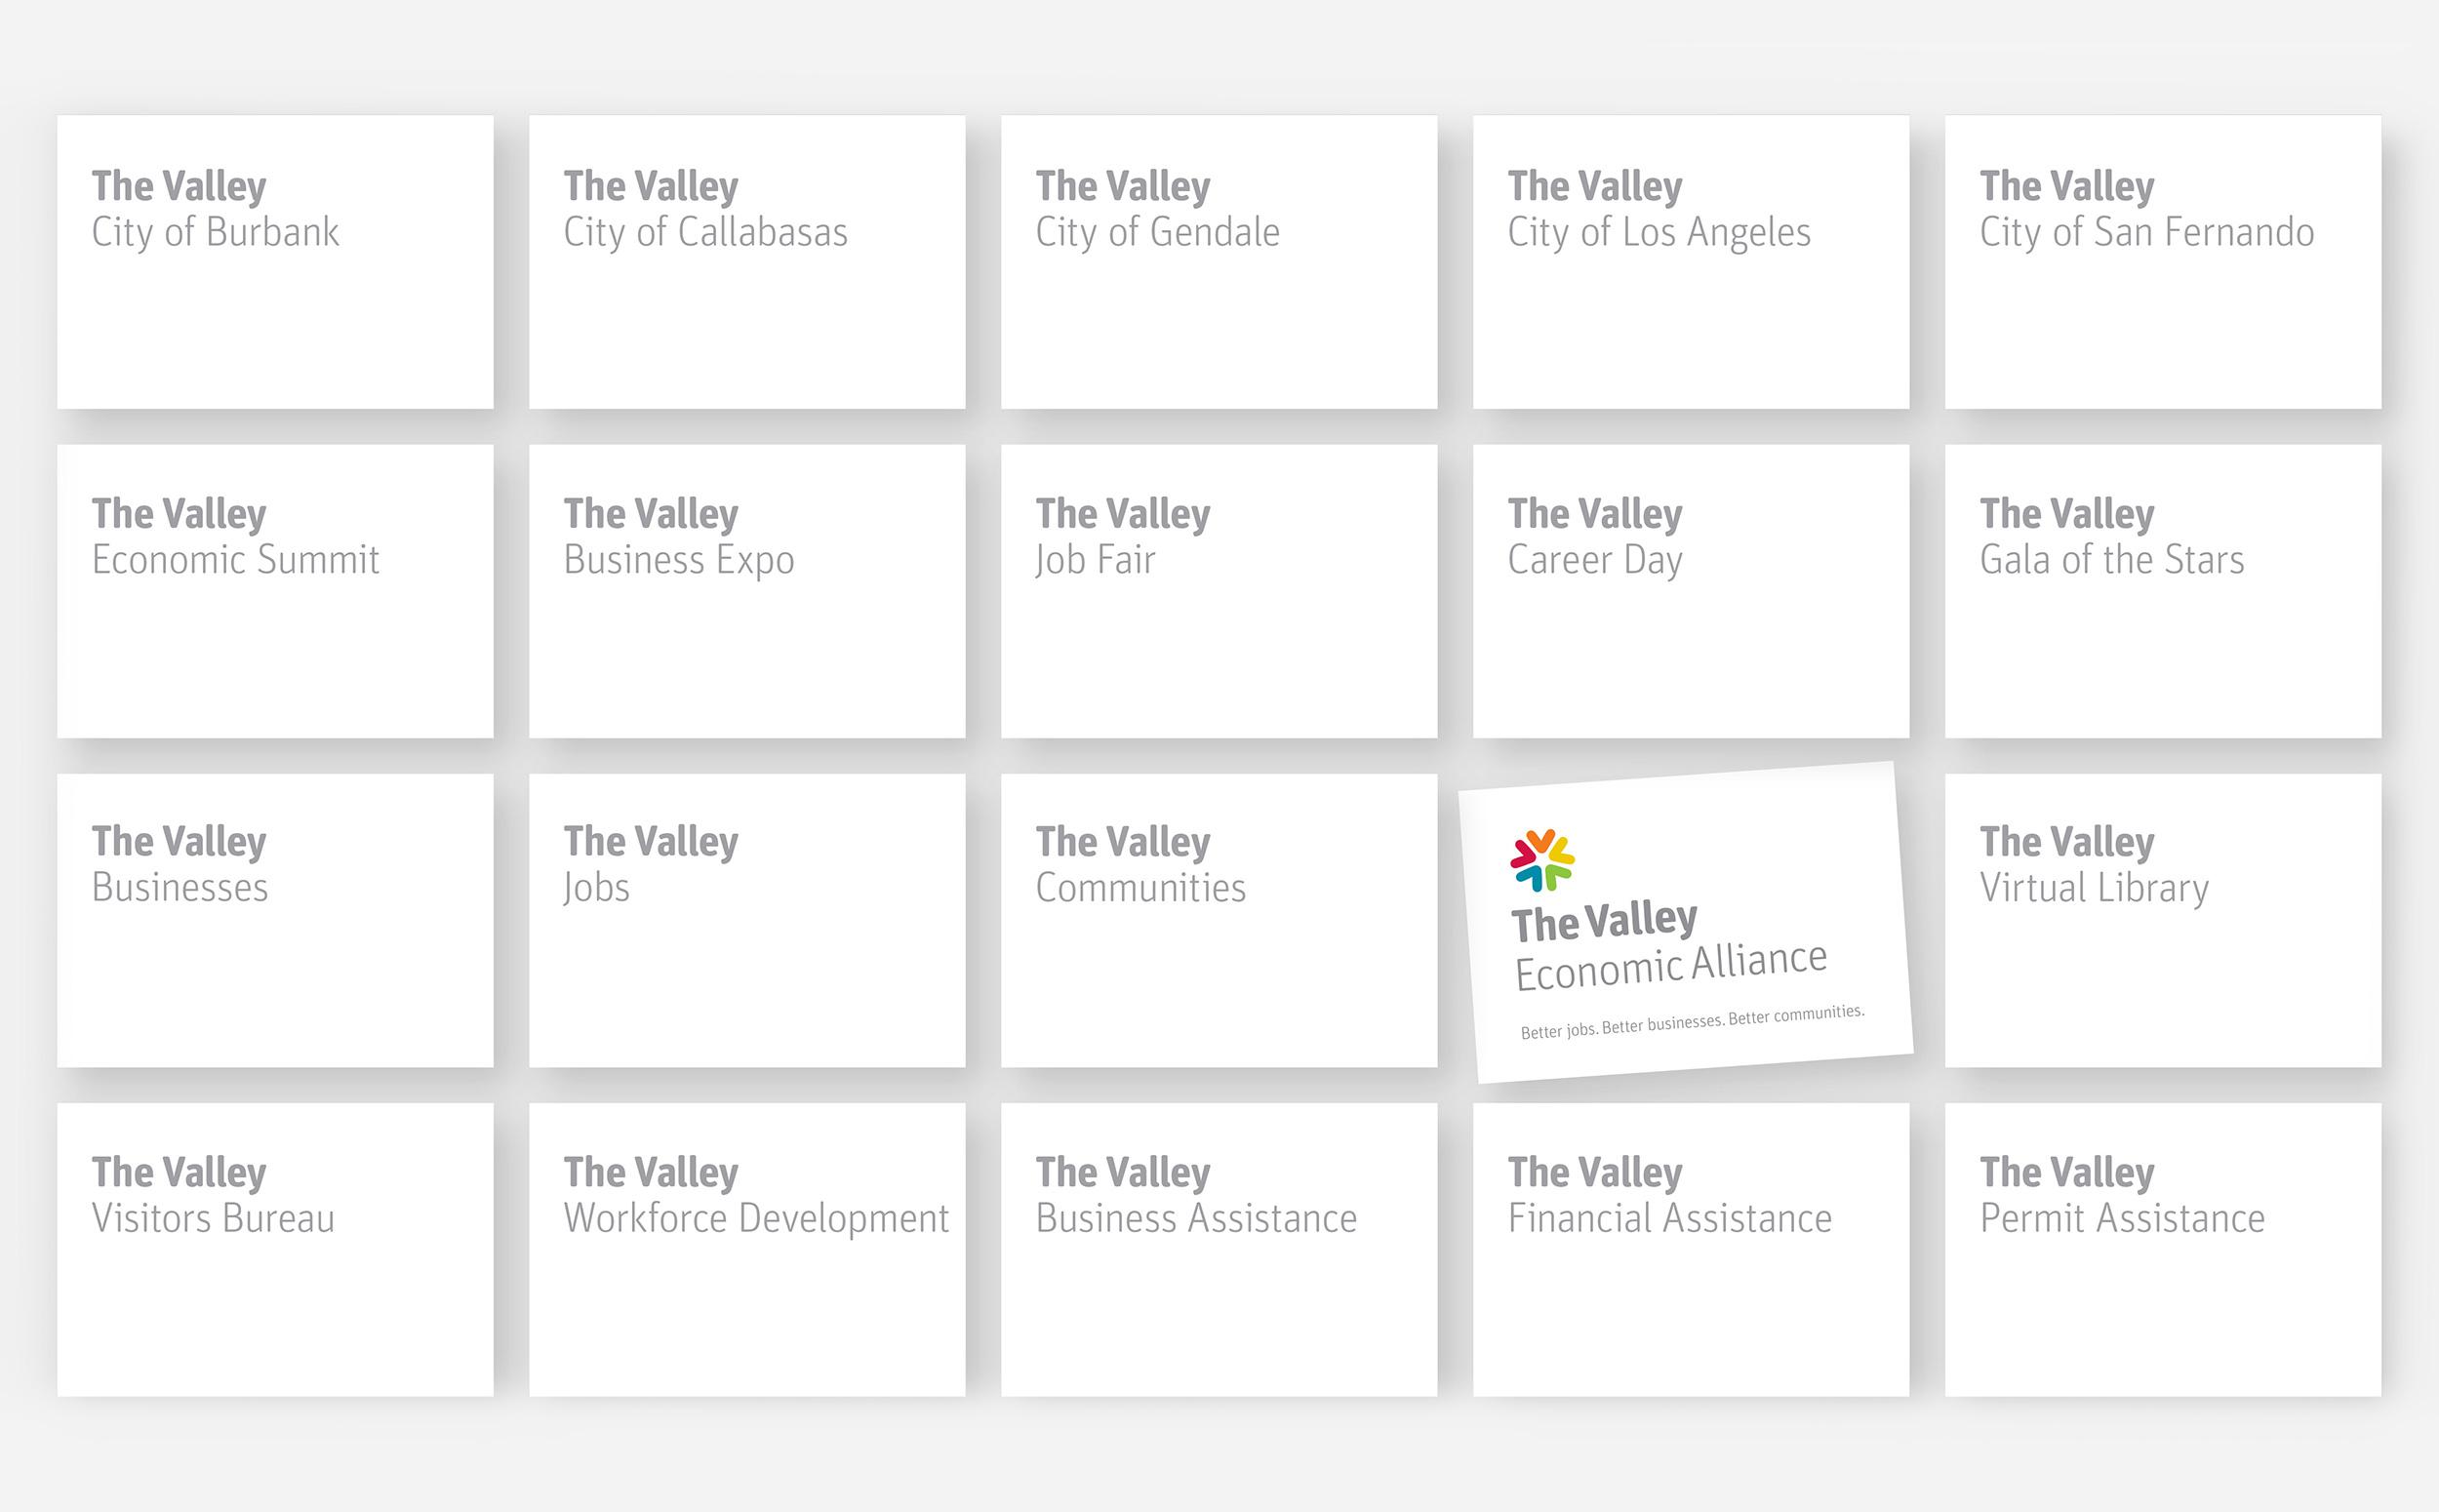 distinc_valley_economic_alliance_all_Card.jpg